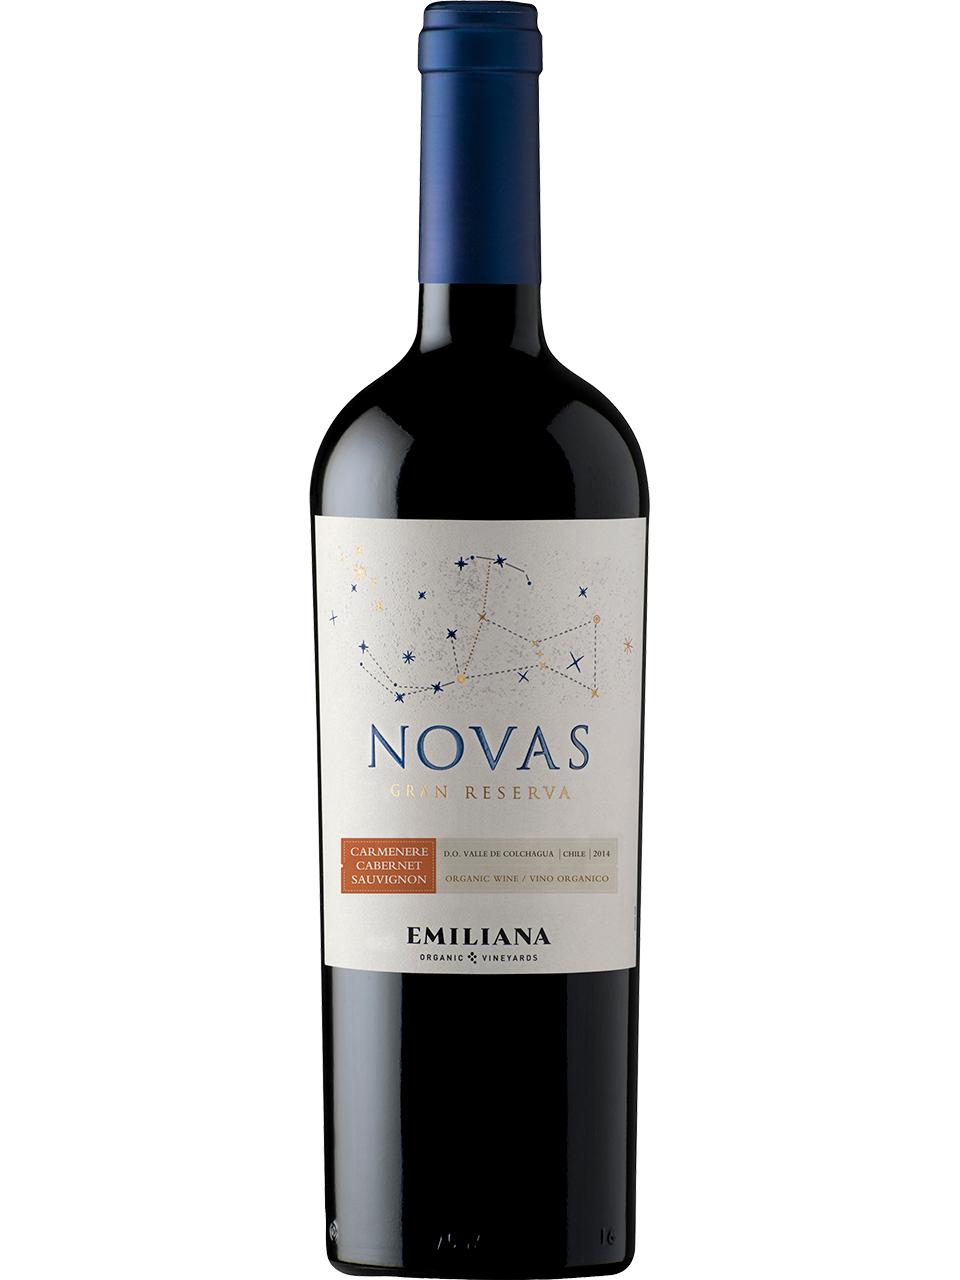 Novas Carmenere/Cabernet Sauvignon